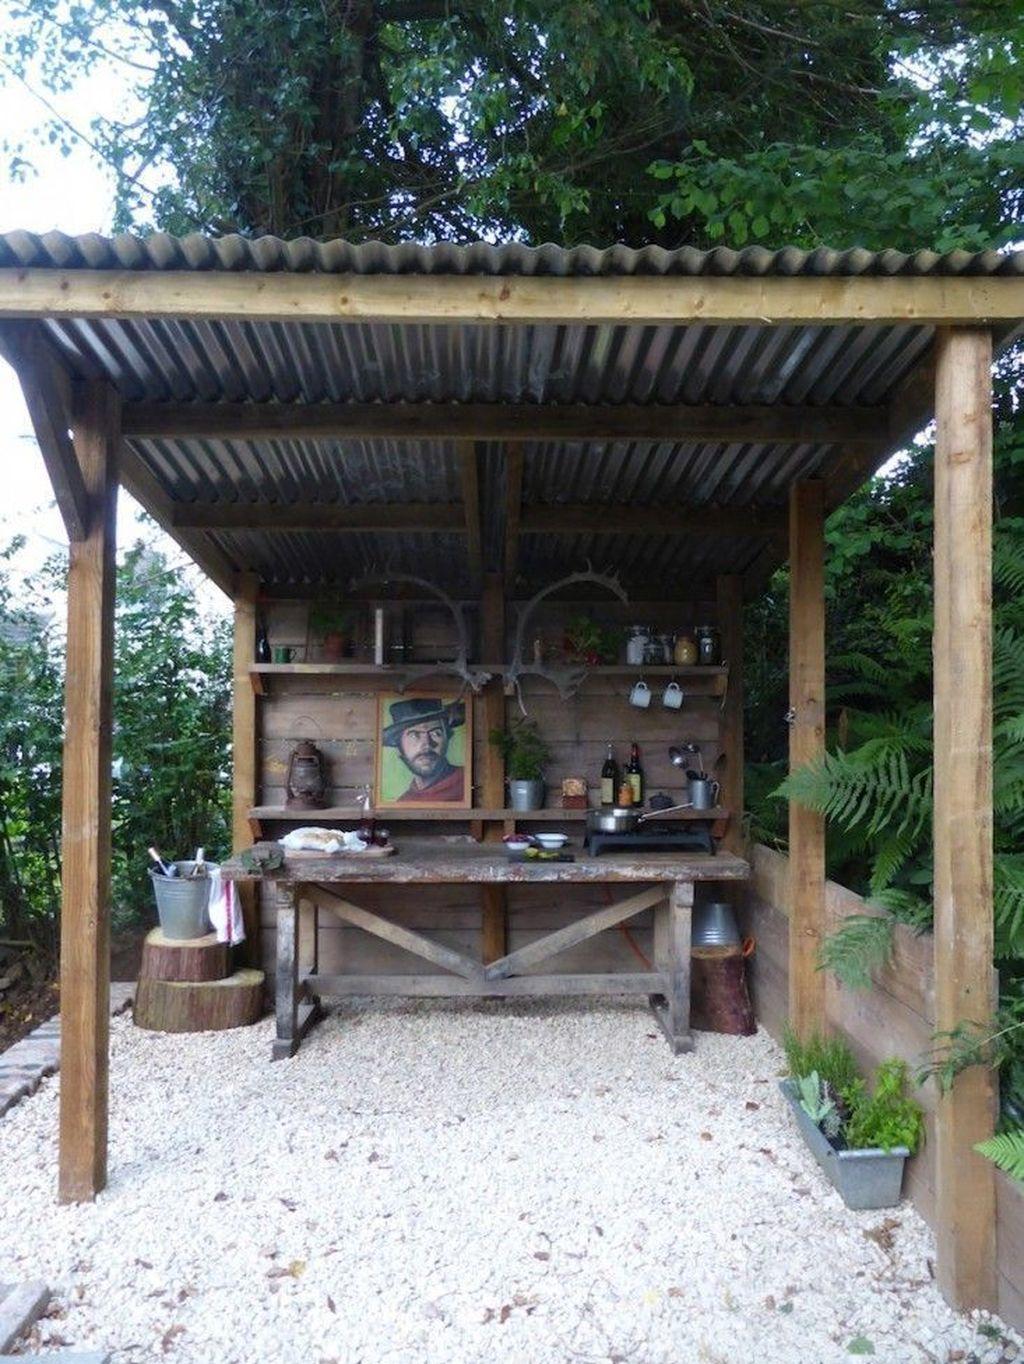 Stunning Outdoor Kitchen Design Ideas For Perfect Summer 32